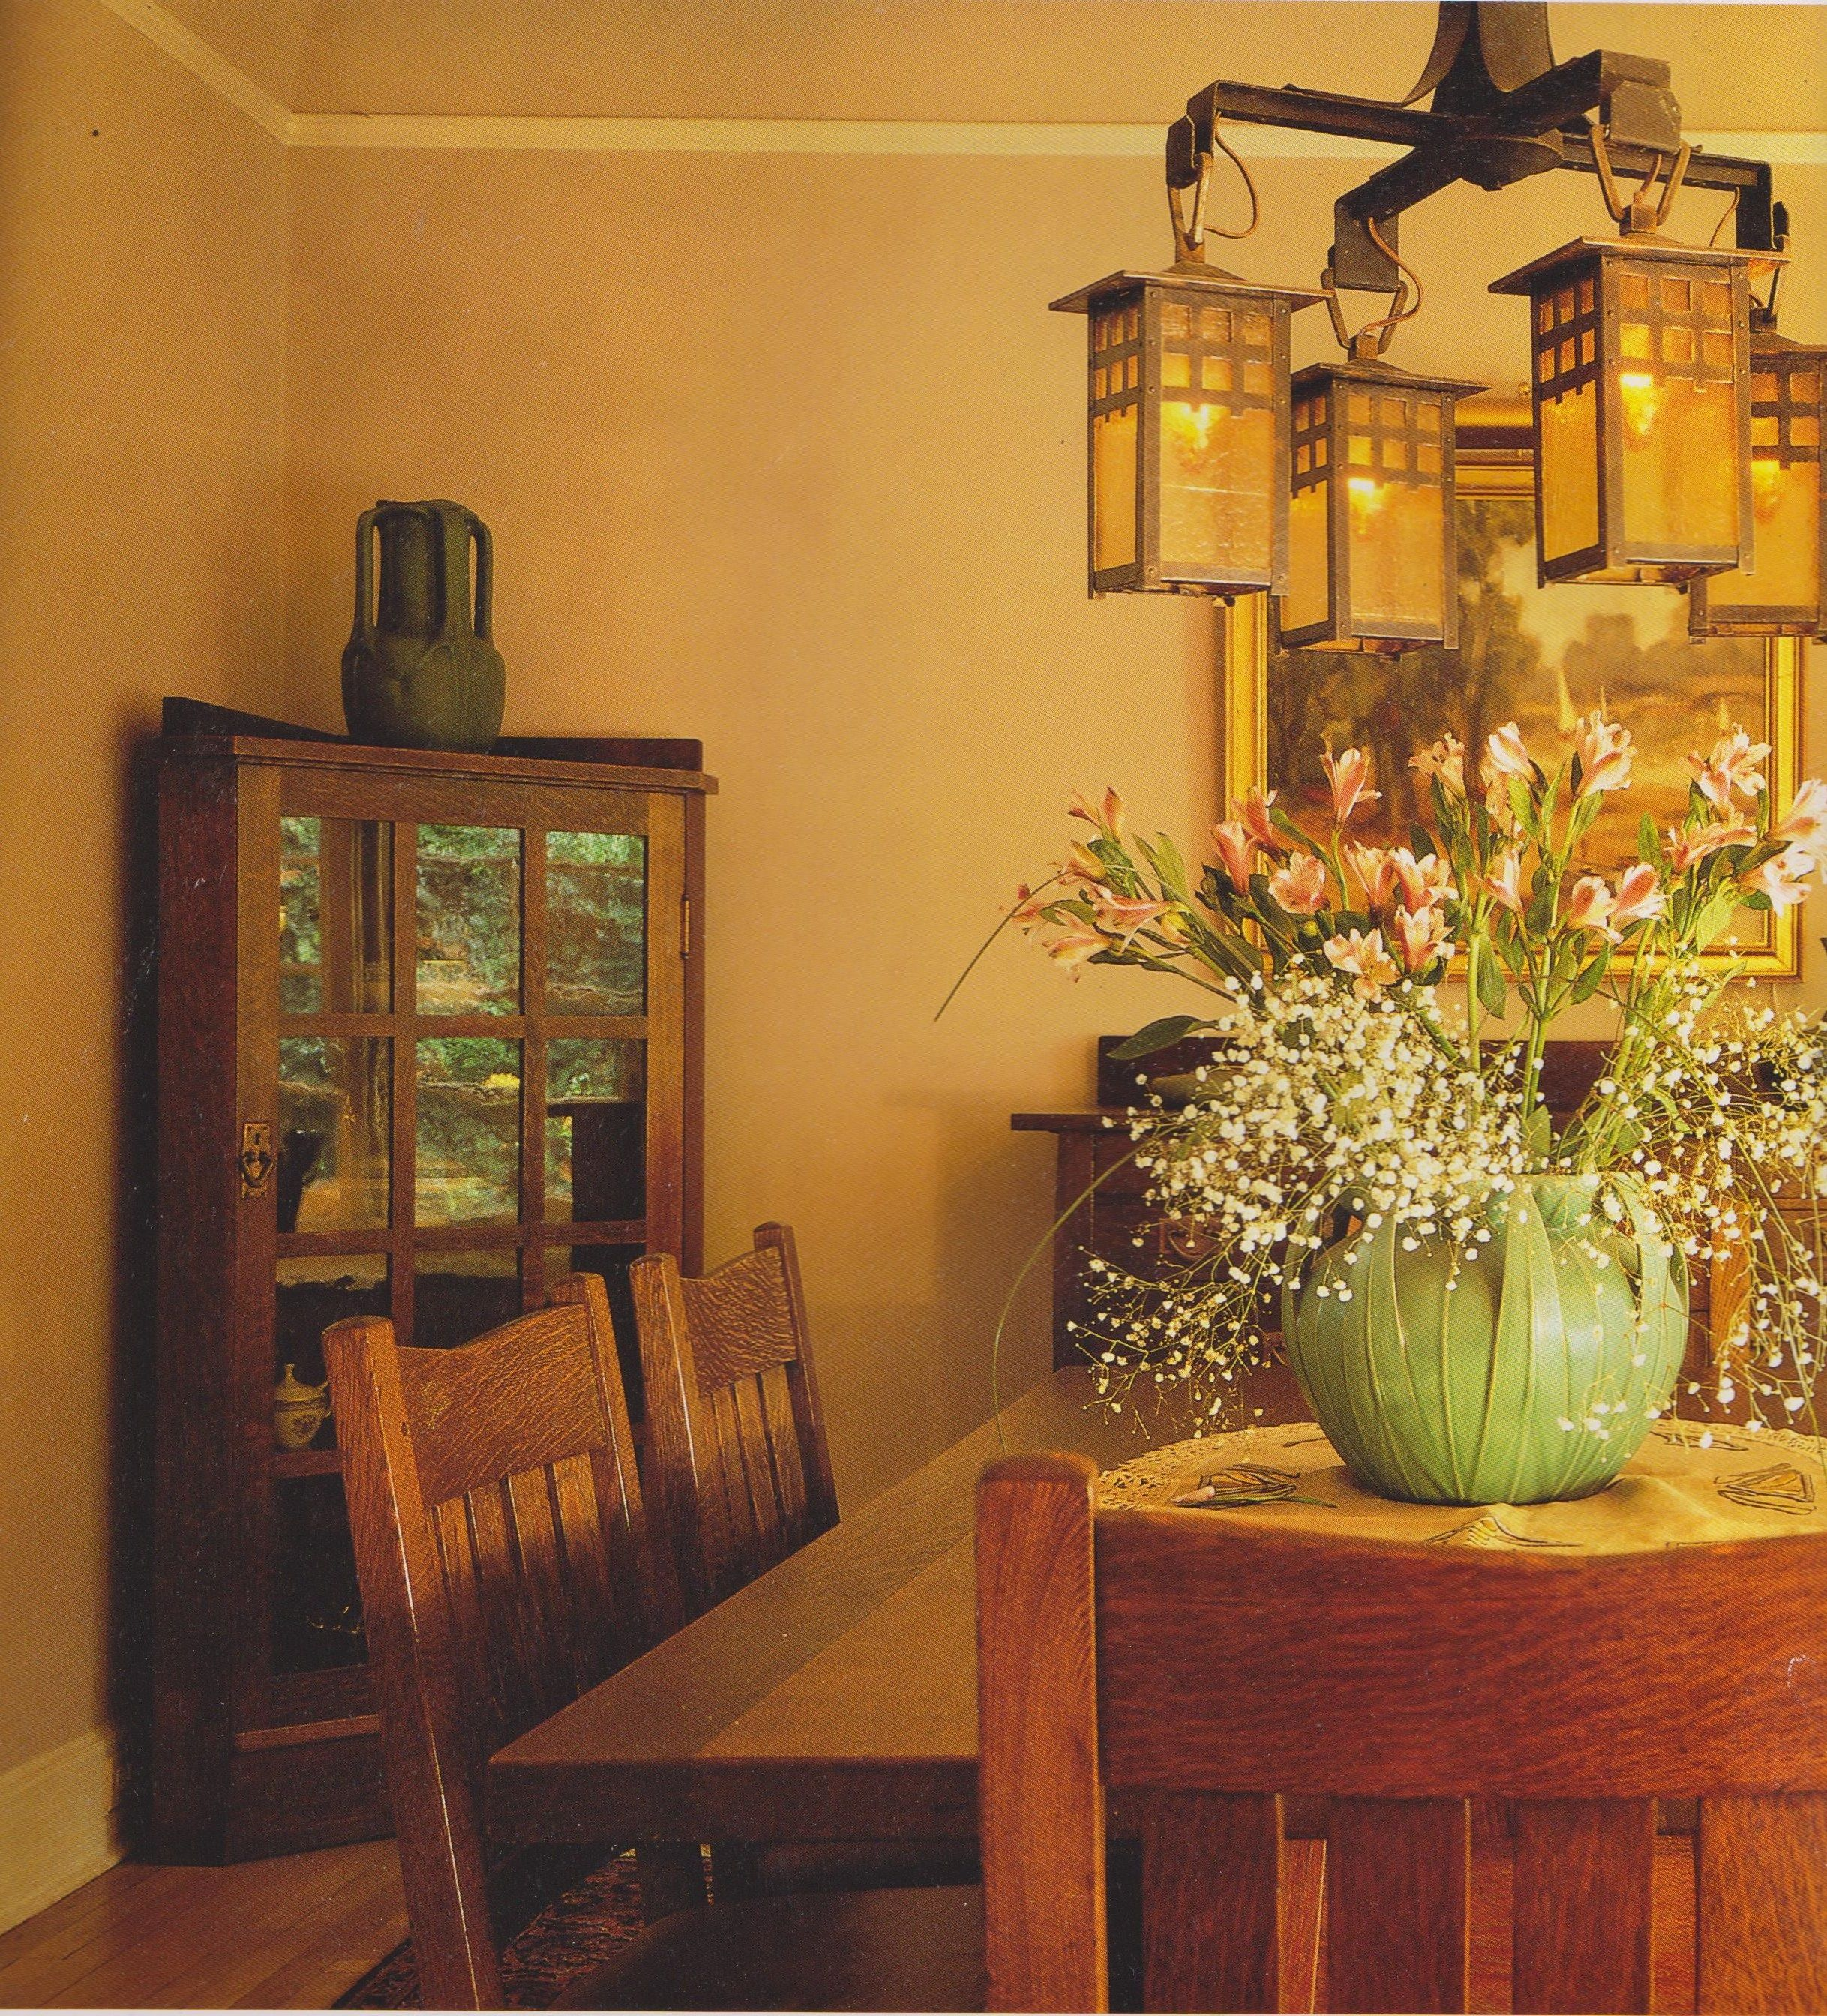 Arts crafts craftsman bungalow dining room - Arts and crafts bungalow interiors ...